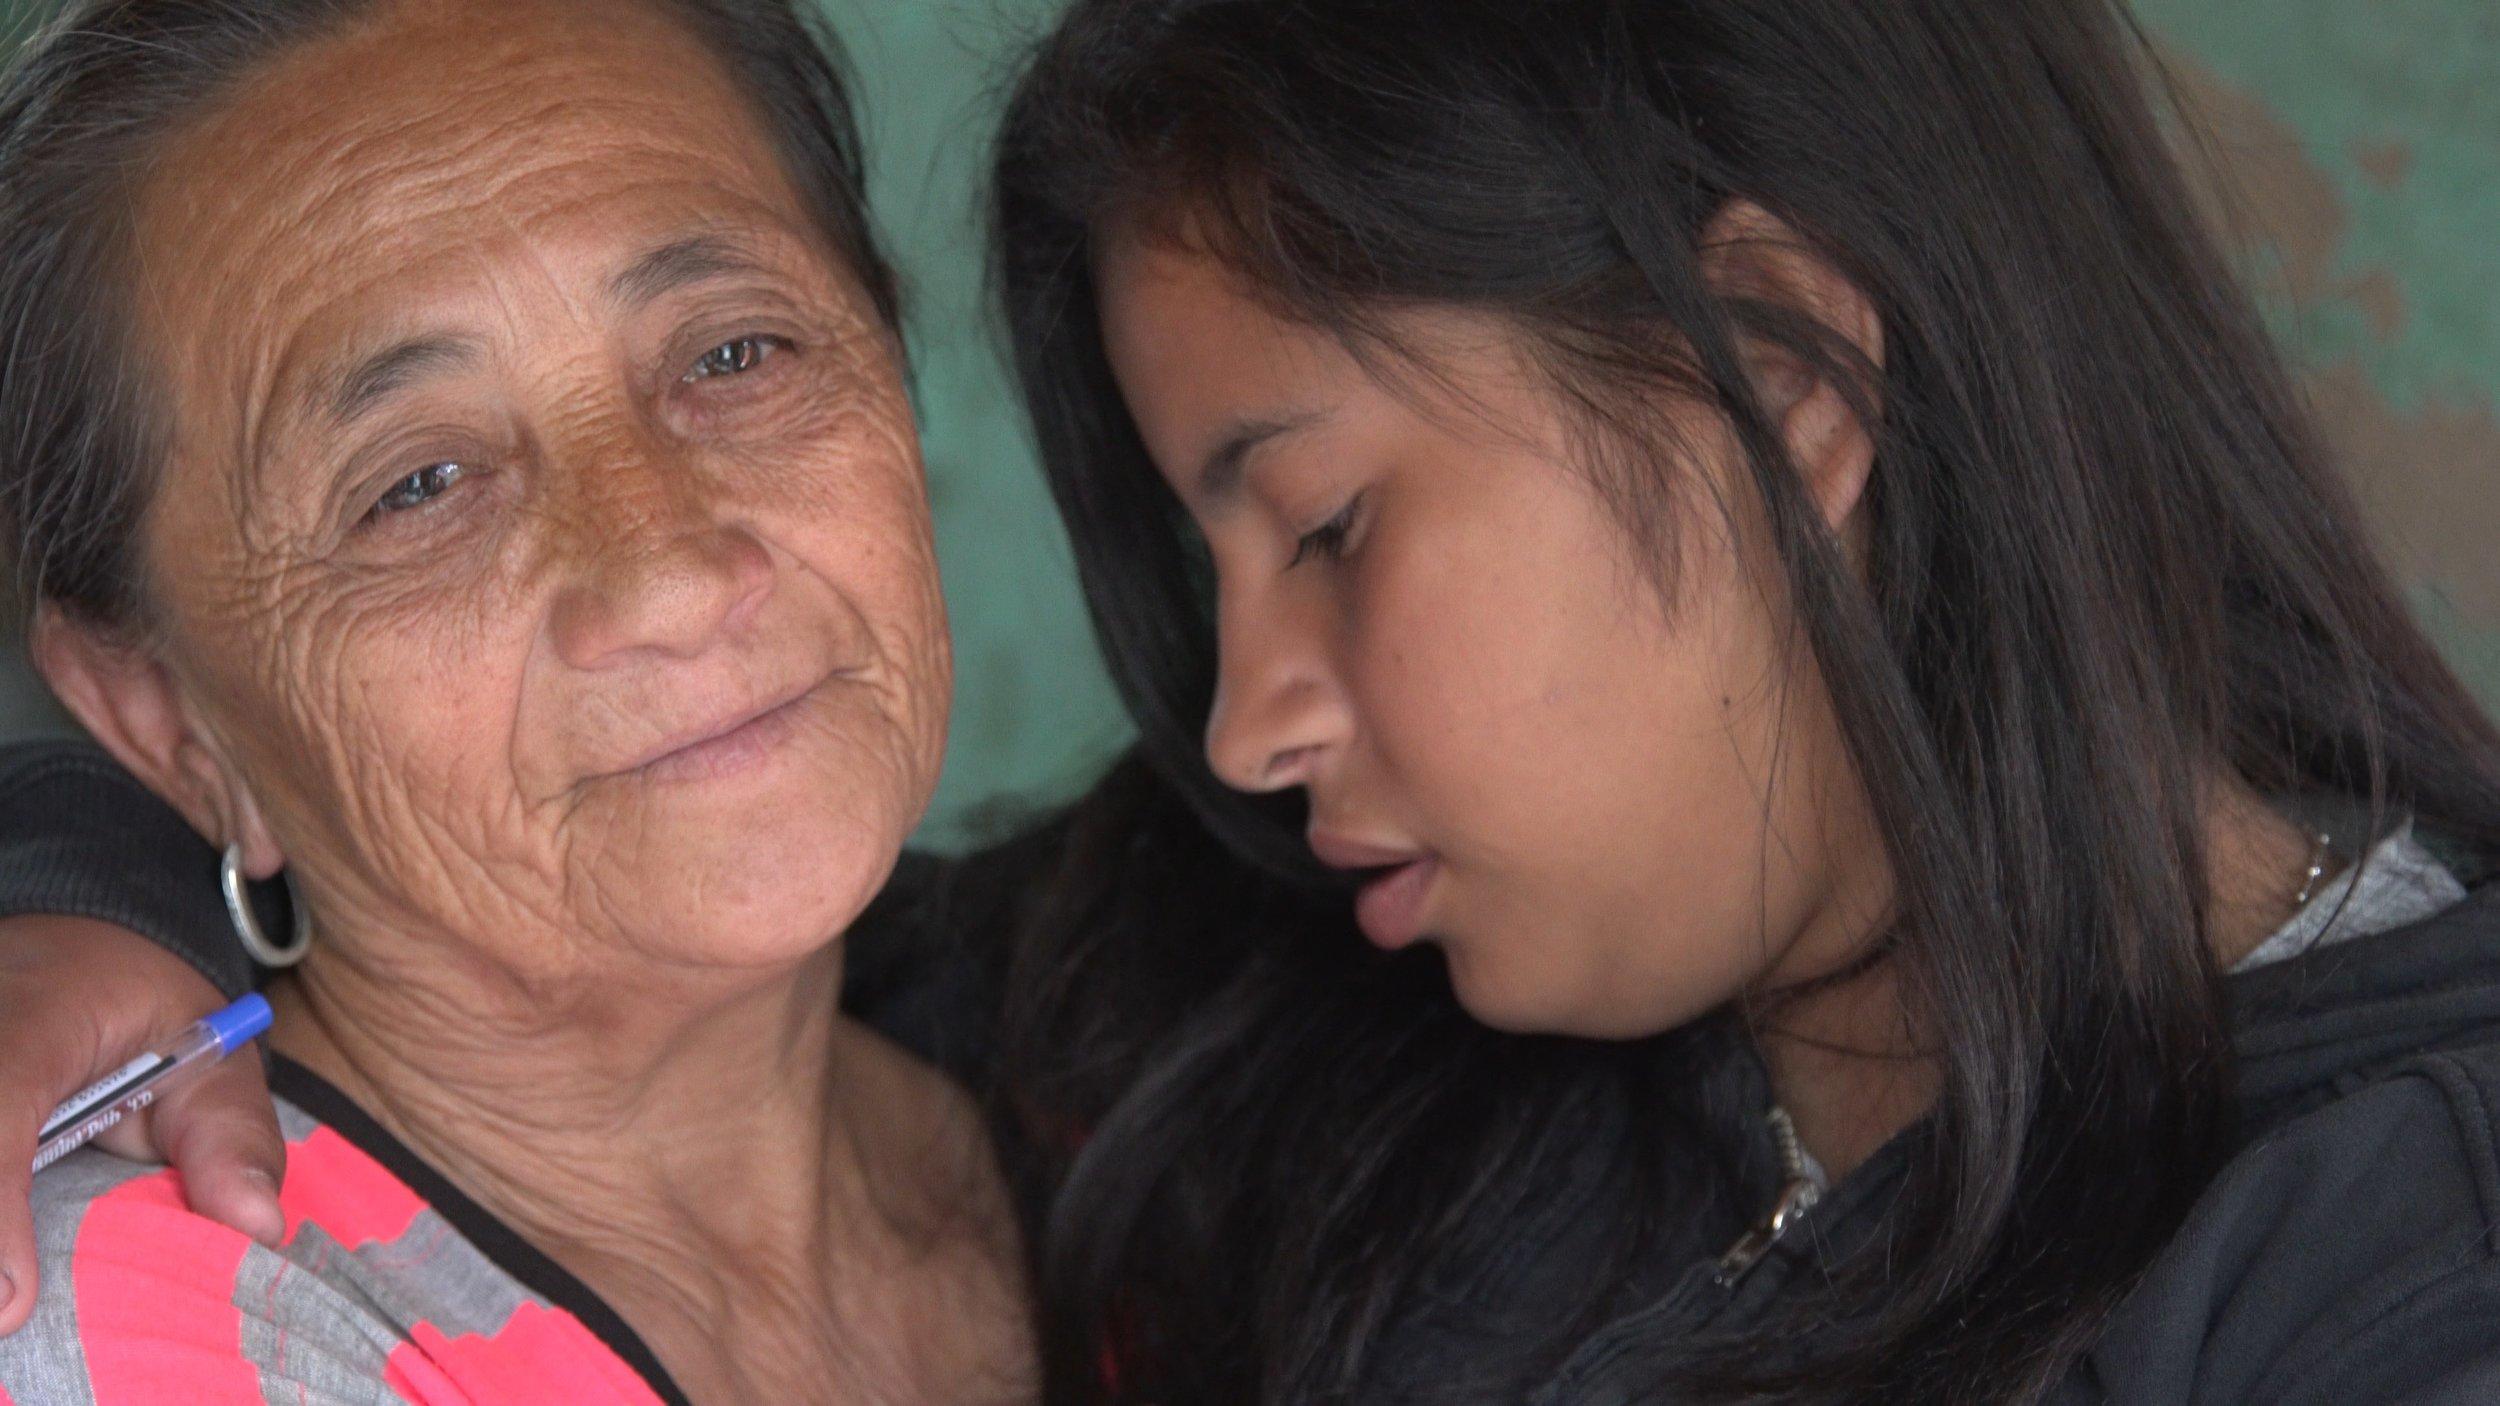 Liz with her grandmother